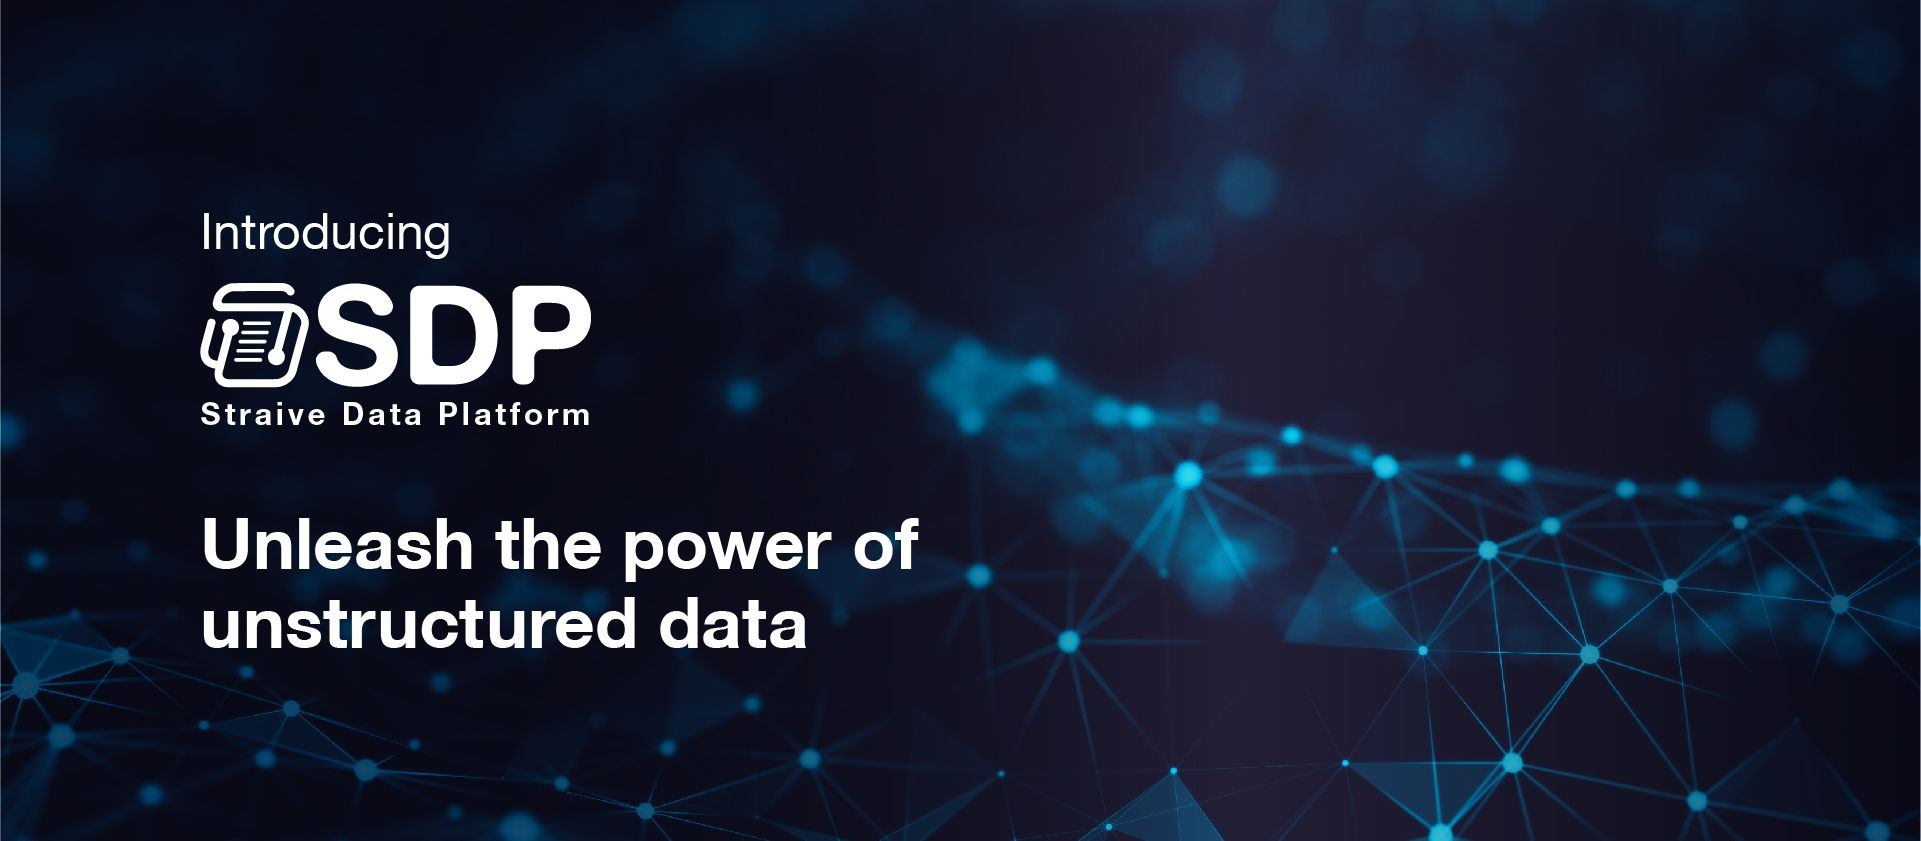 Straive Data Platform - Unleash the power of unstructured data